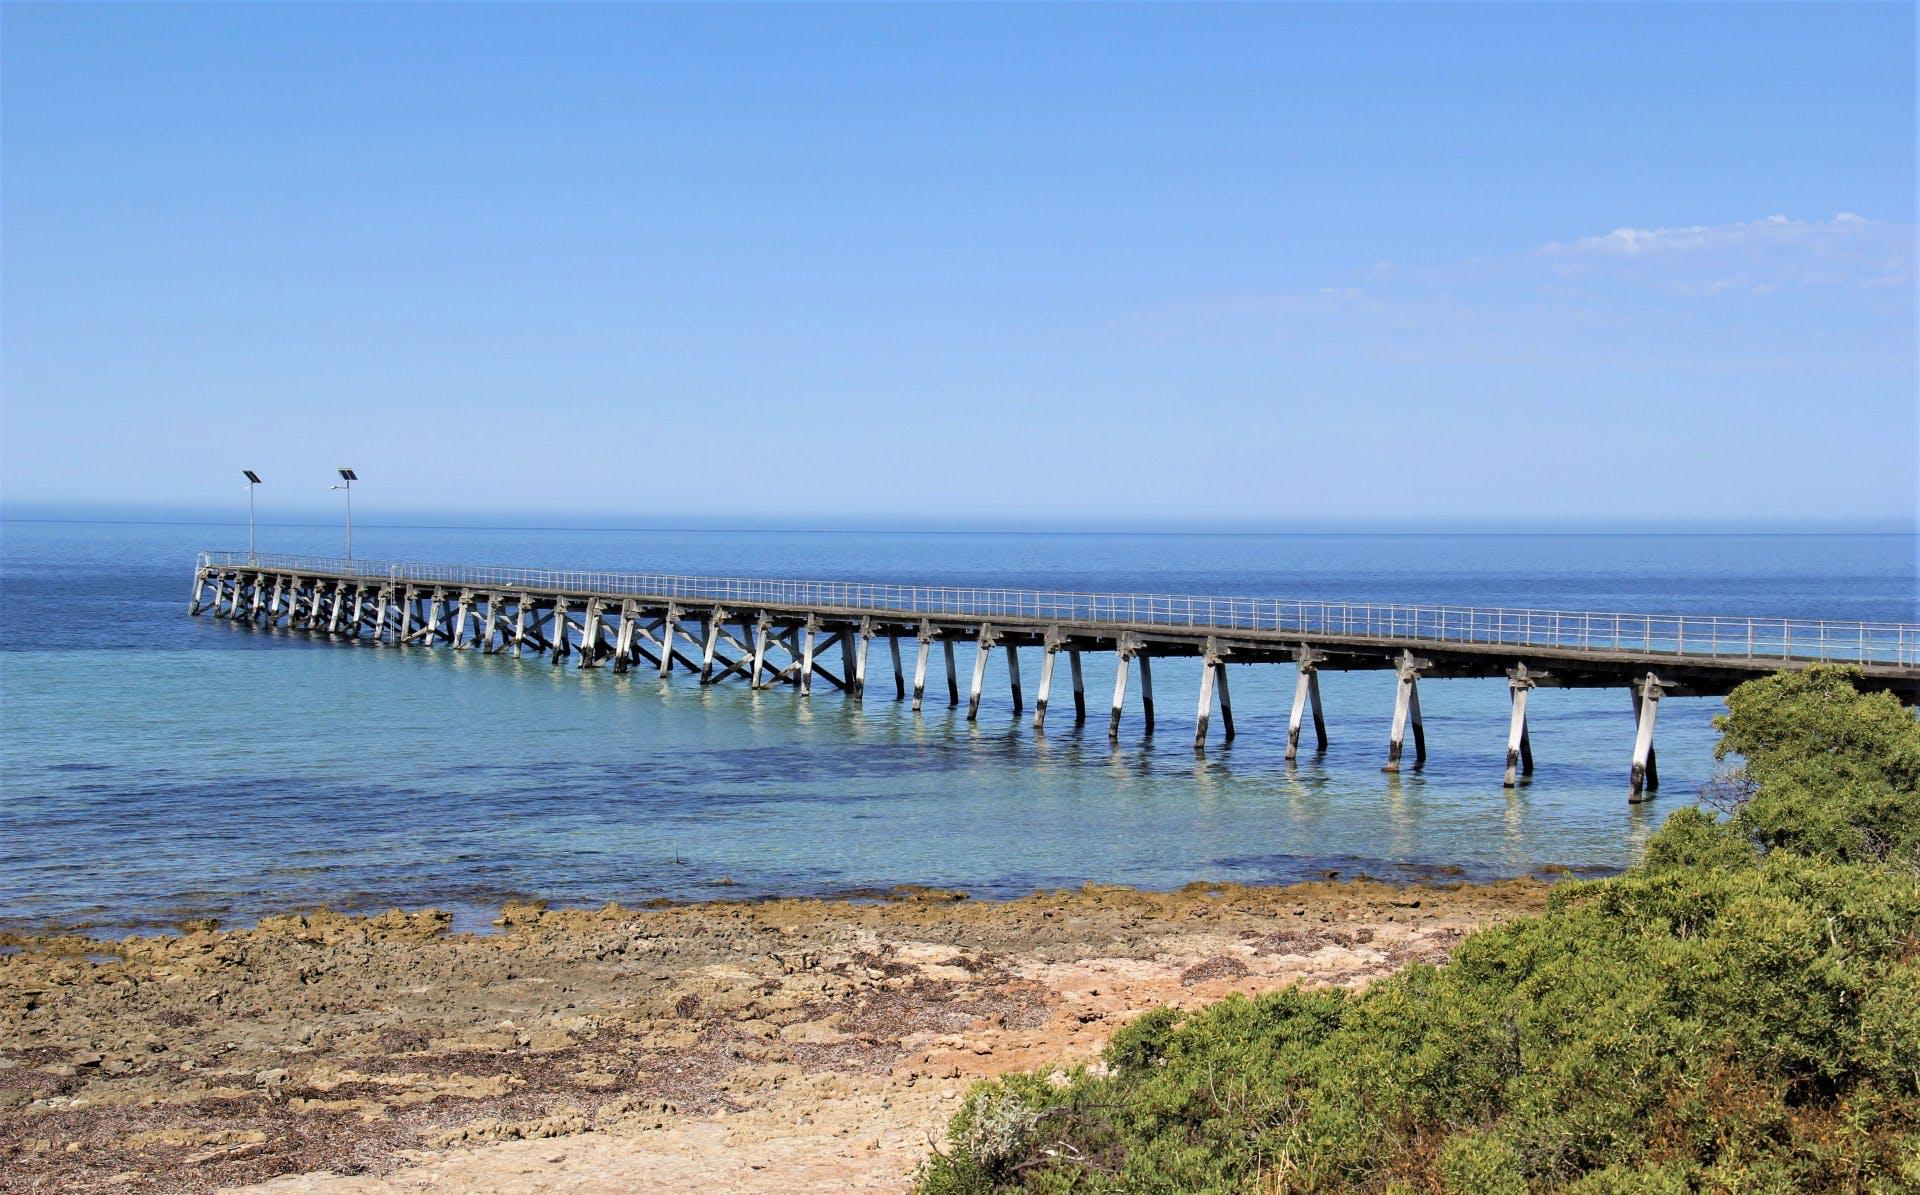 Haslam SA - The jetty